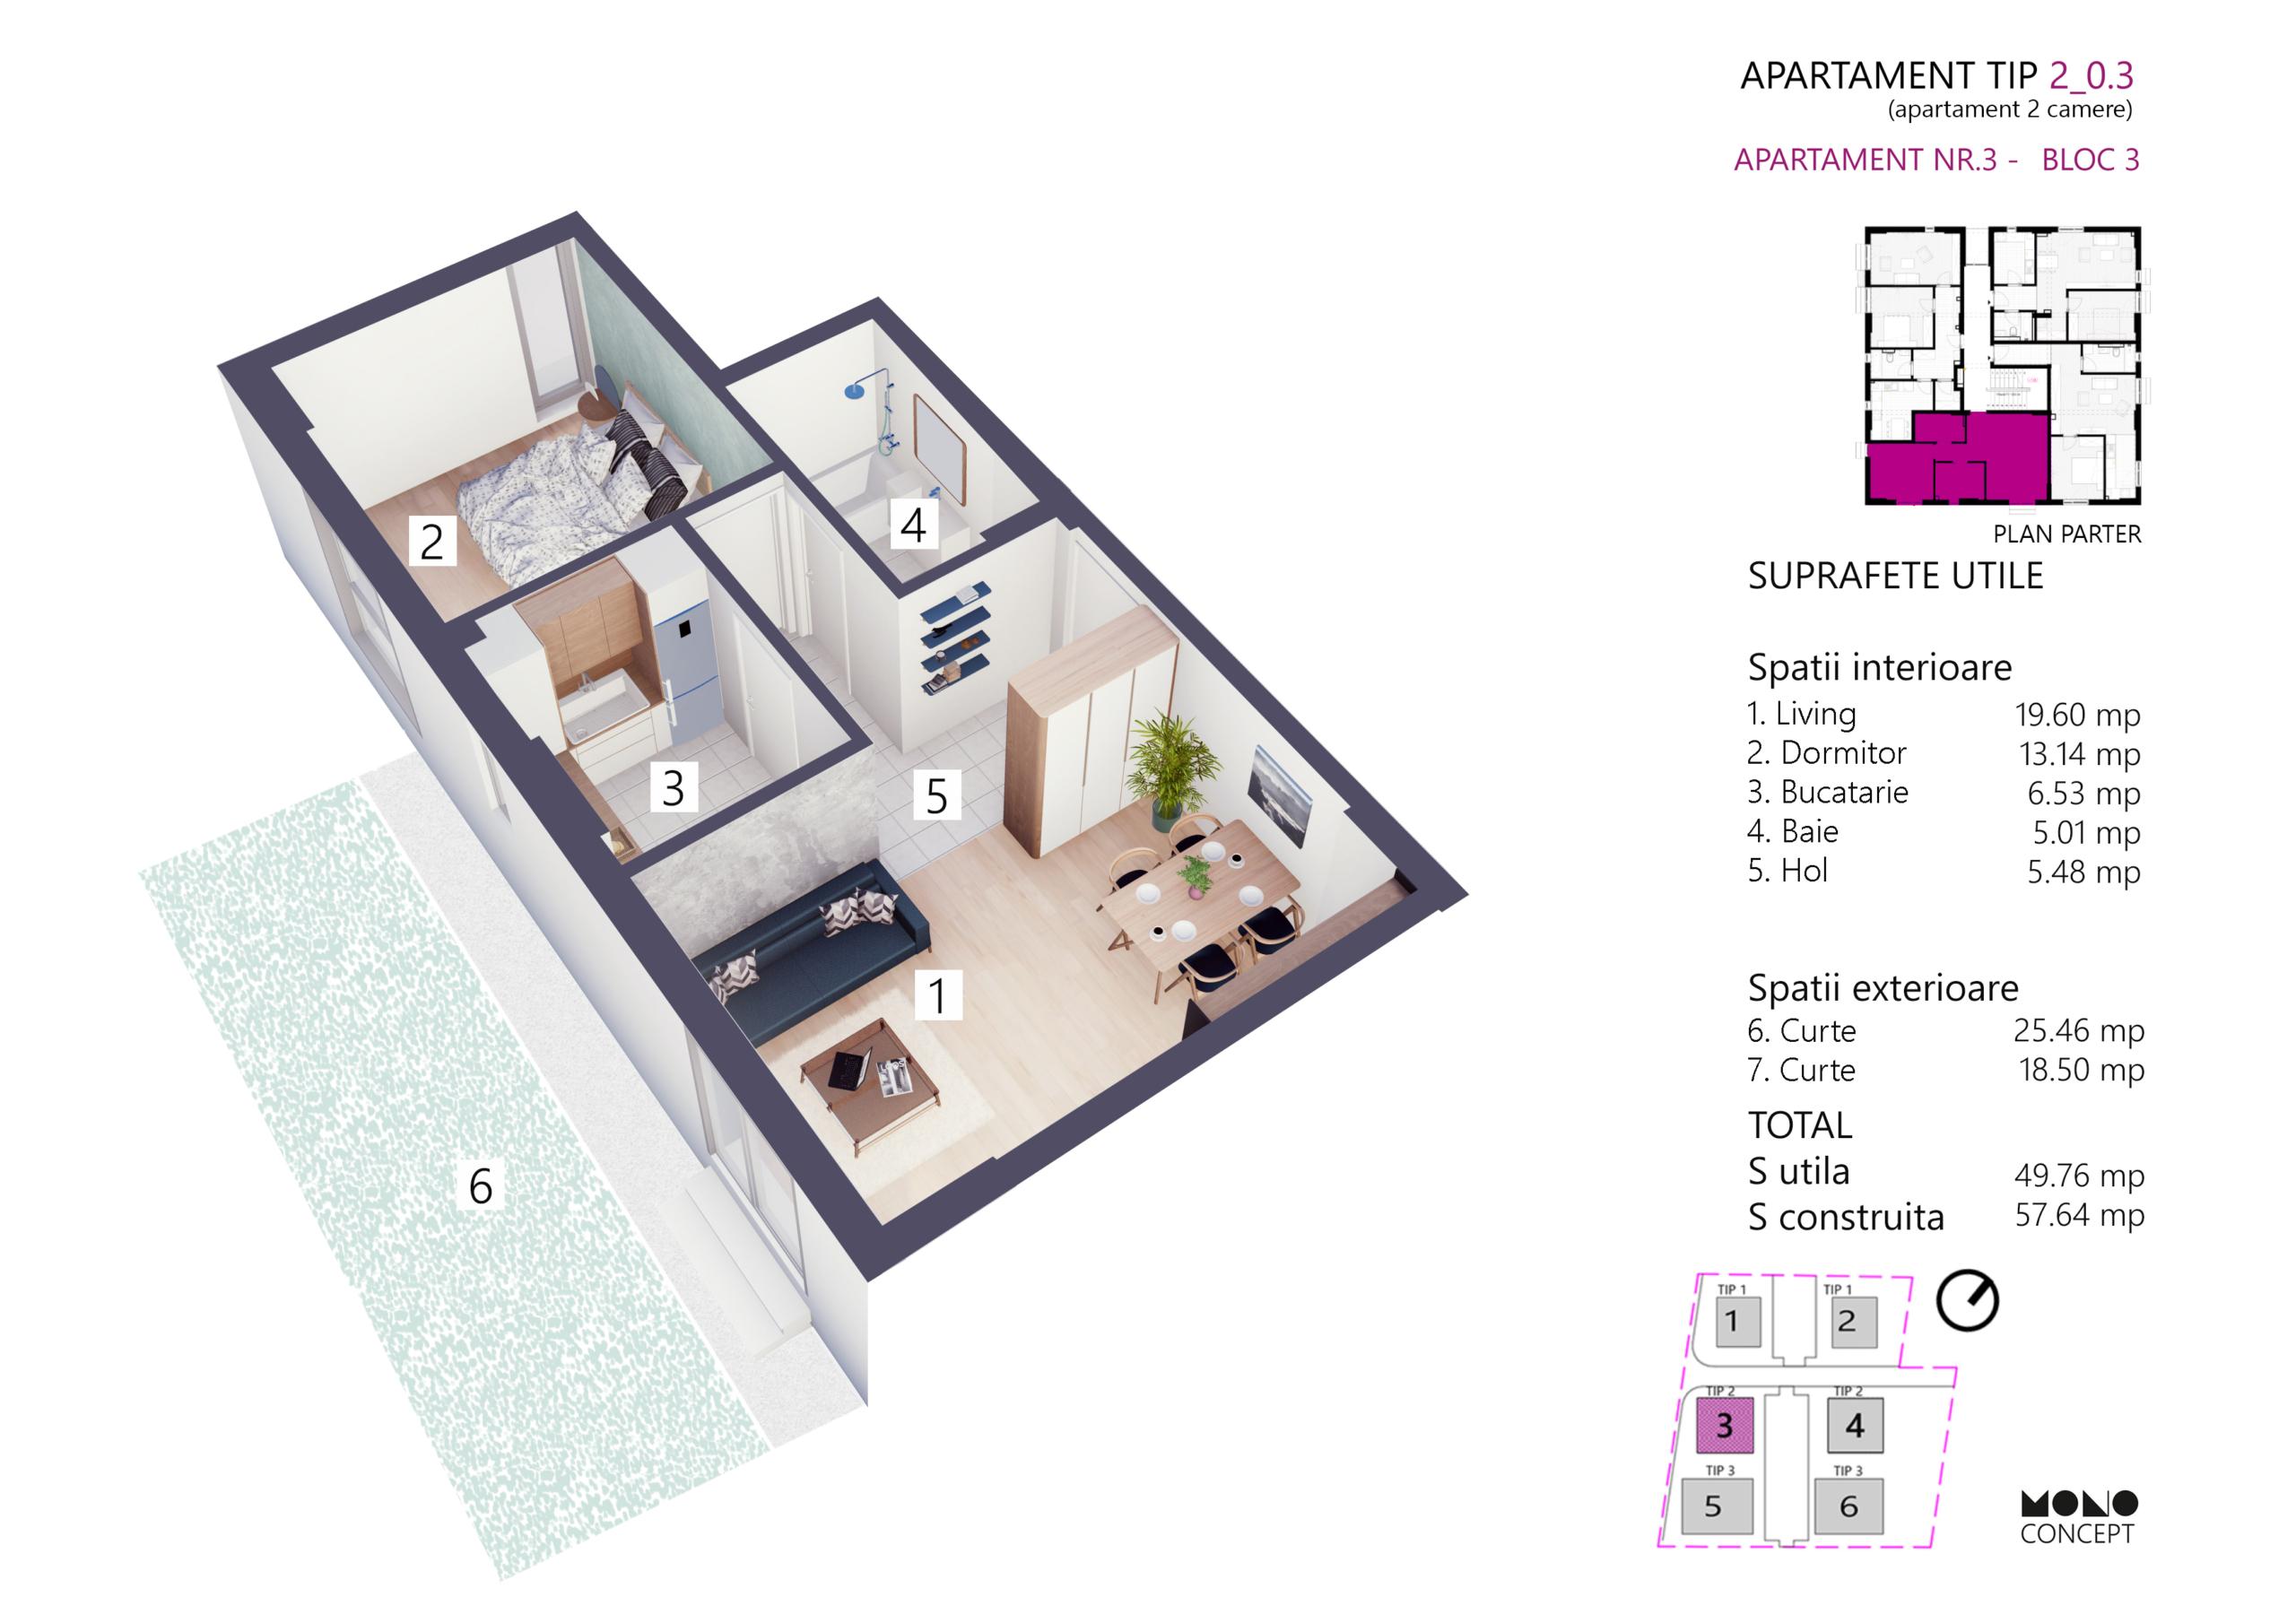 Apartament 2 Camere Parter Bloc 3